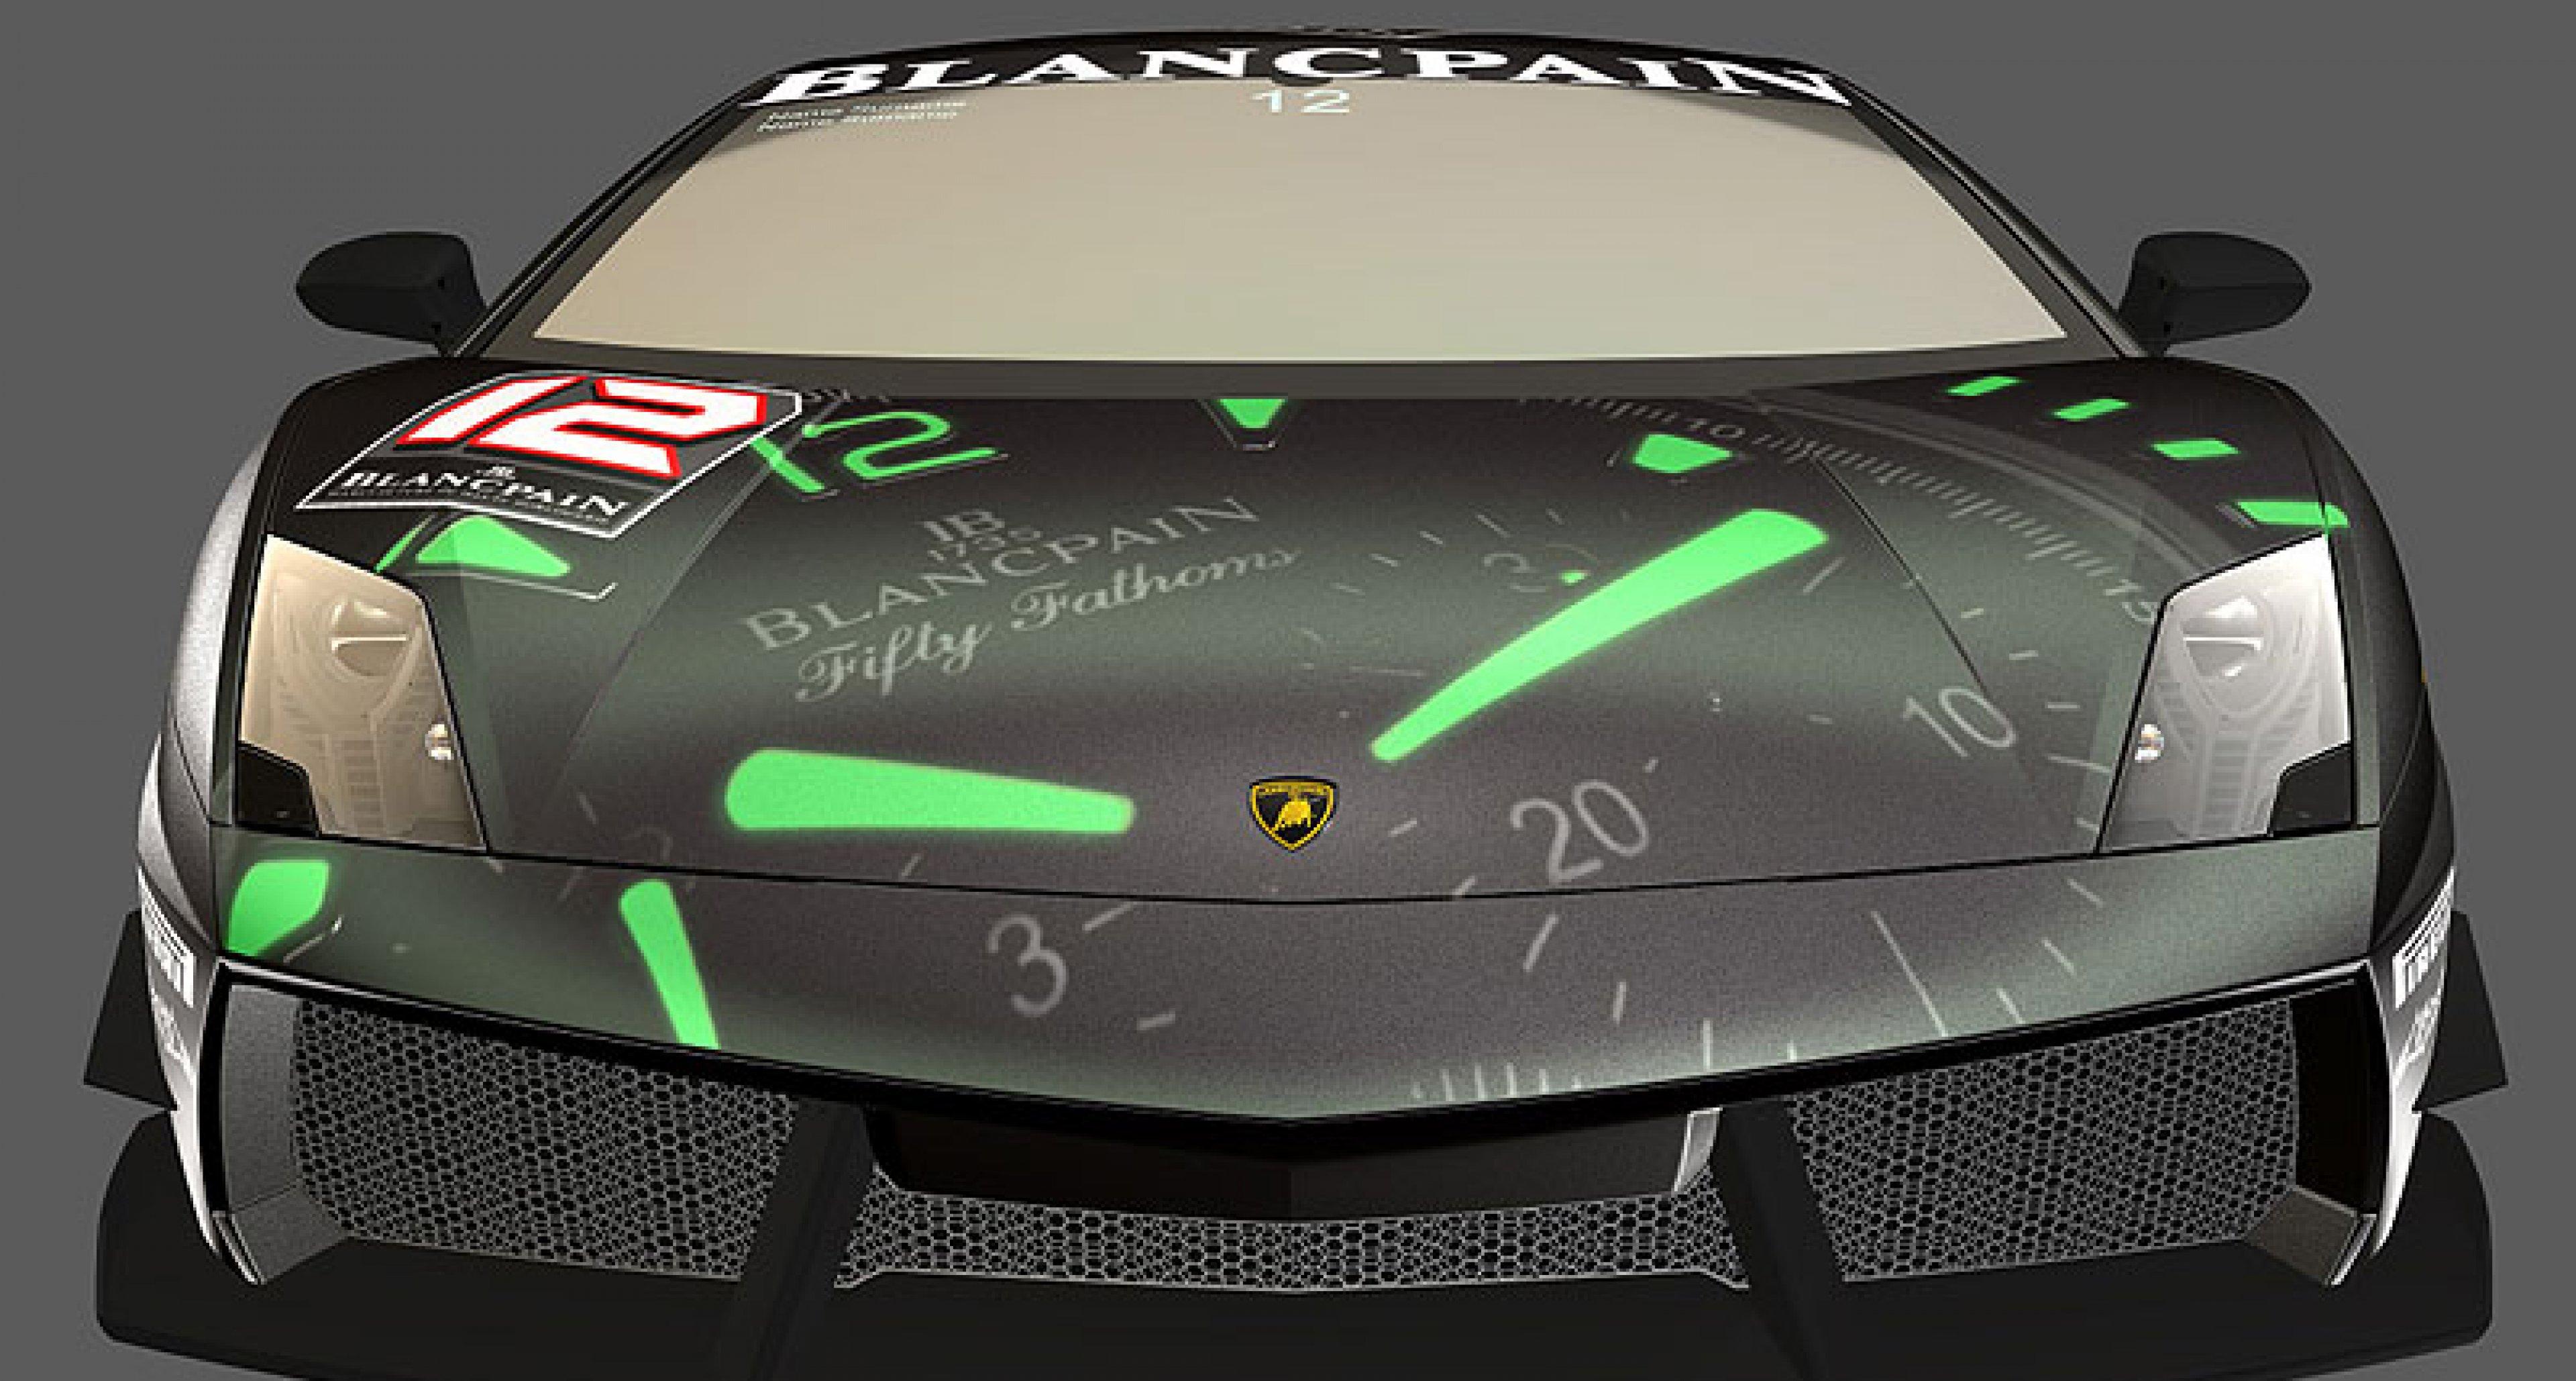 Lamborghini Gallardo LP 560-4 Blancpain Super Trofeo: Lightweightracer